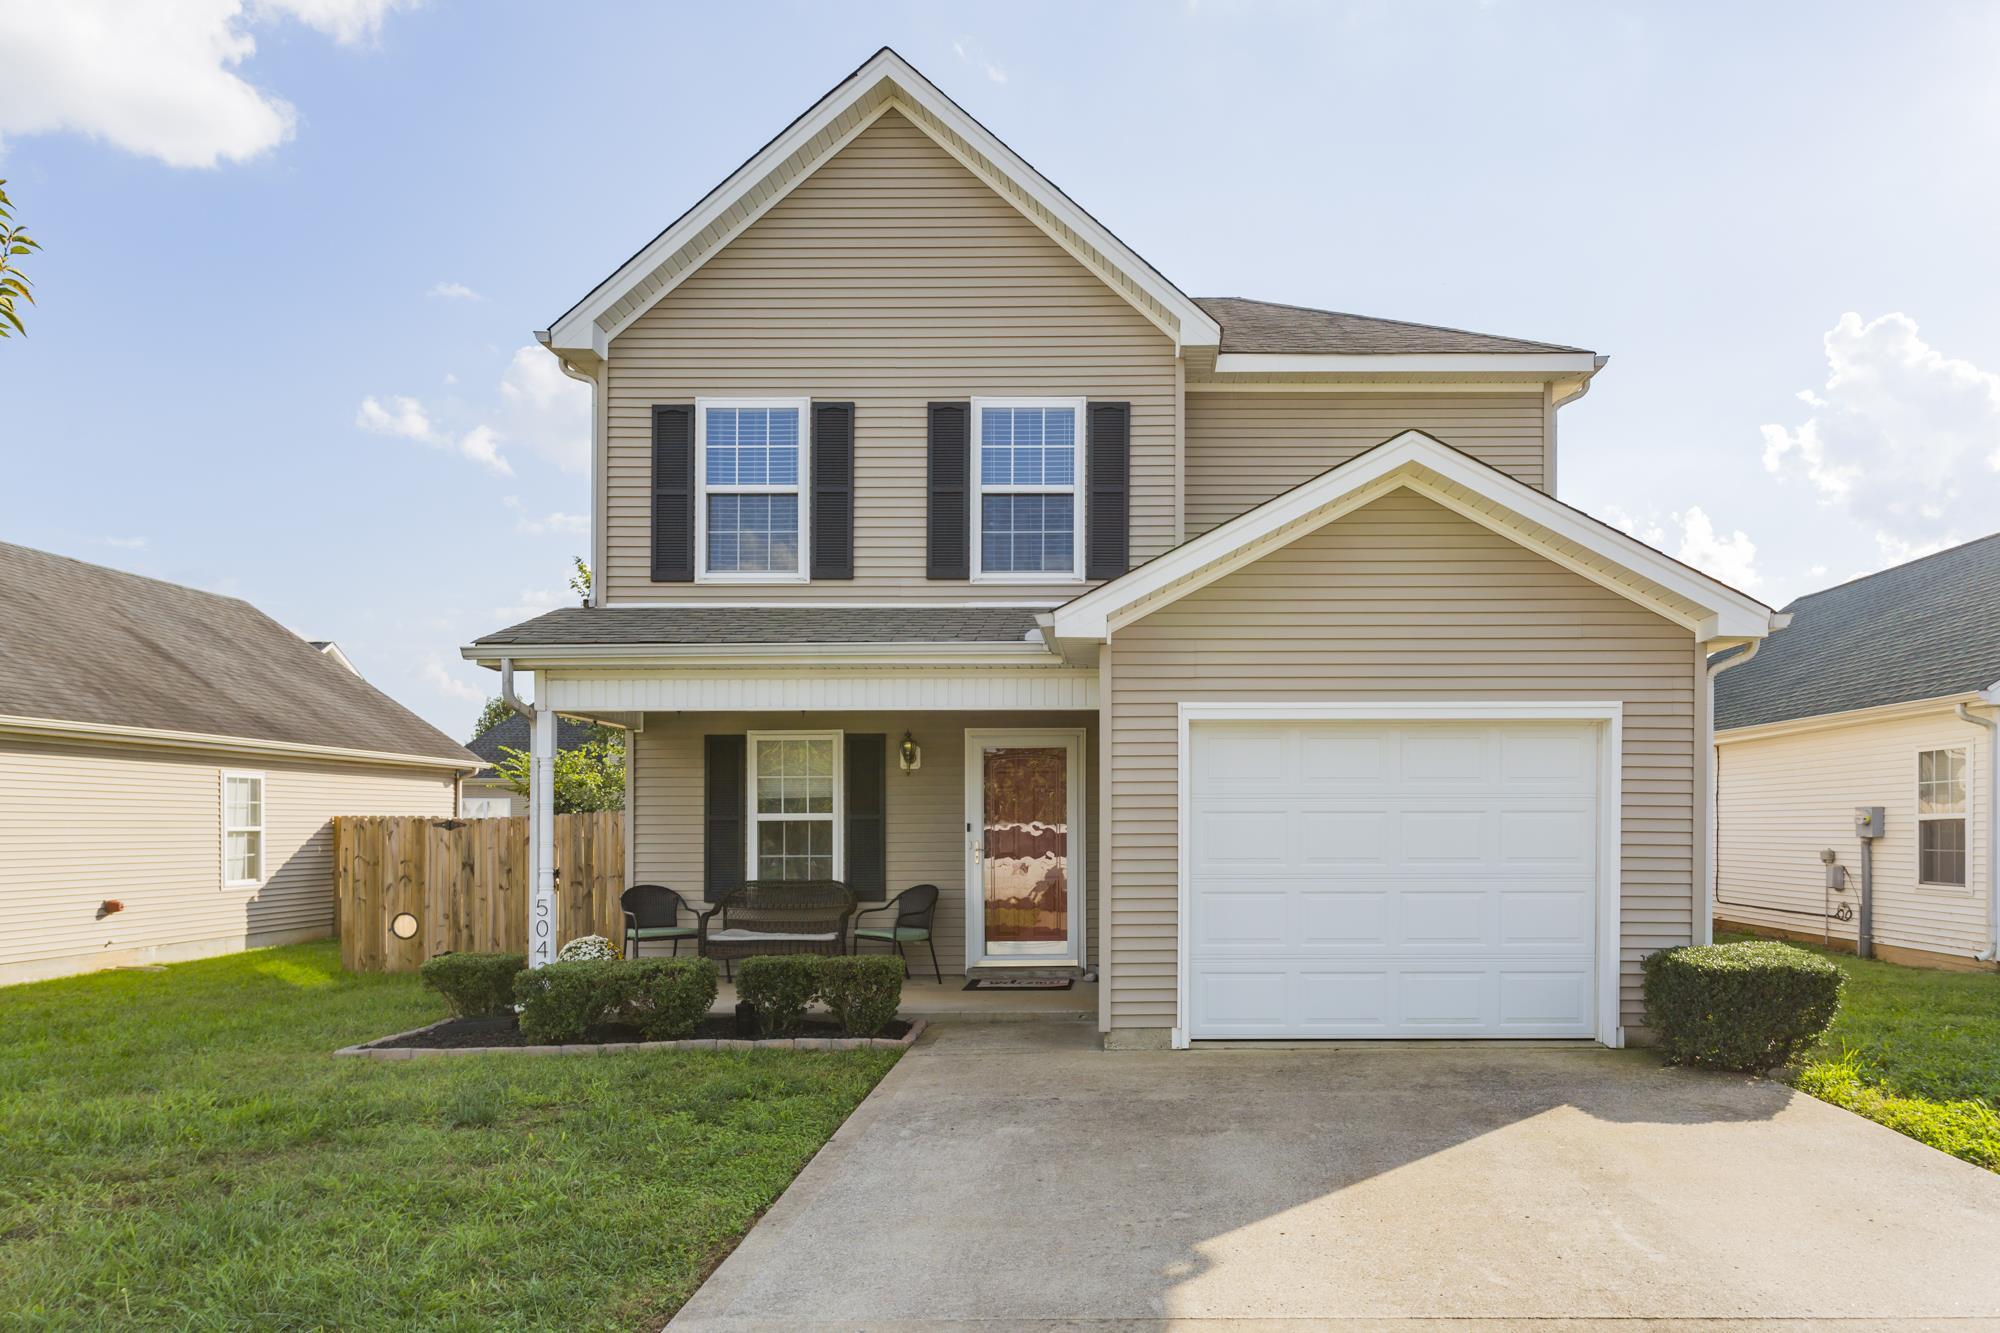 5043 Nina Marie Ave, Murfreesboro, TN 37129